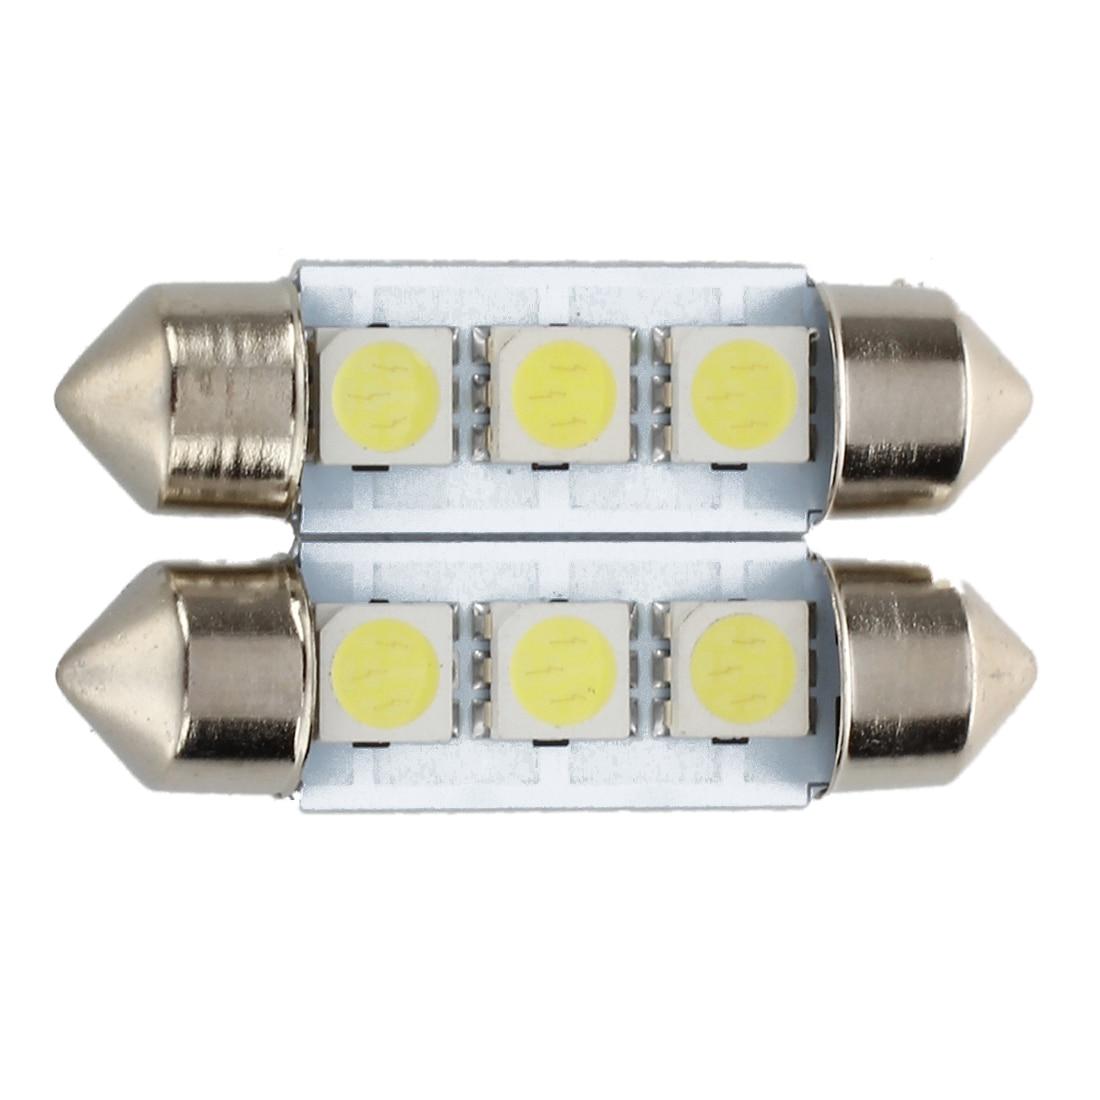 2pcs C5W 3 LED SMD 5050 36mm Xenon White Bulb plate shuttle Festoons dome ceiling lamp car light2pcs C5W 3 LED SMD 5050 36mm Xenon White Bulb plate shuttle Festoons dome ceiling lamp car light